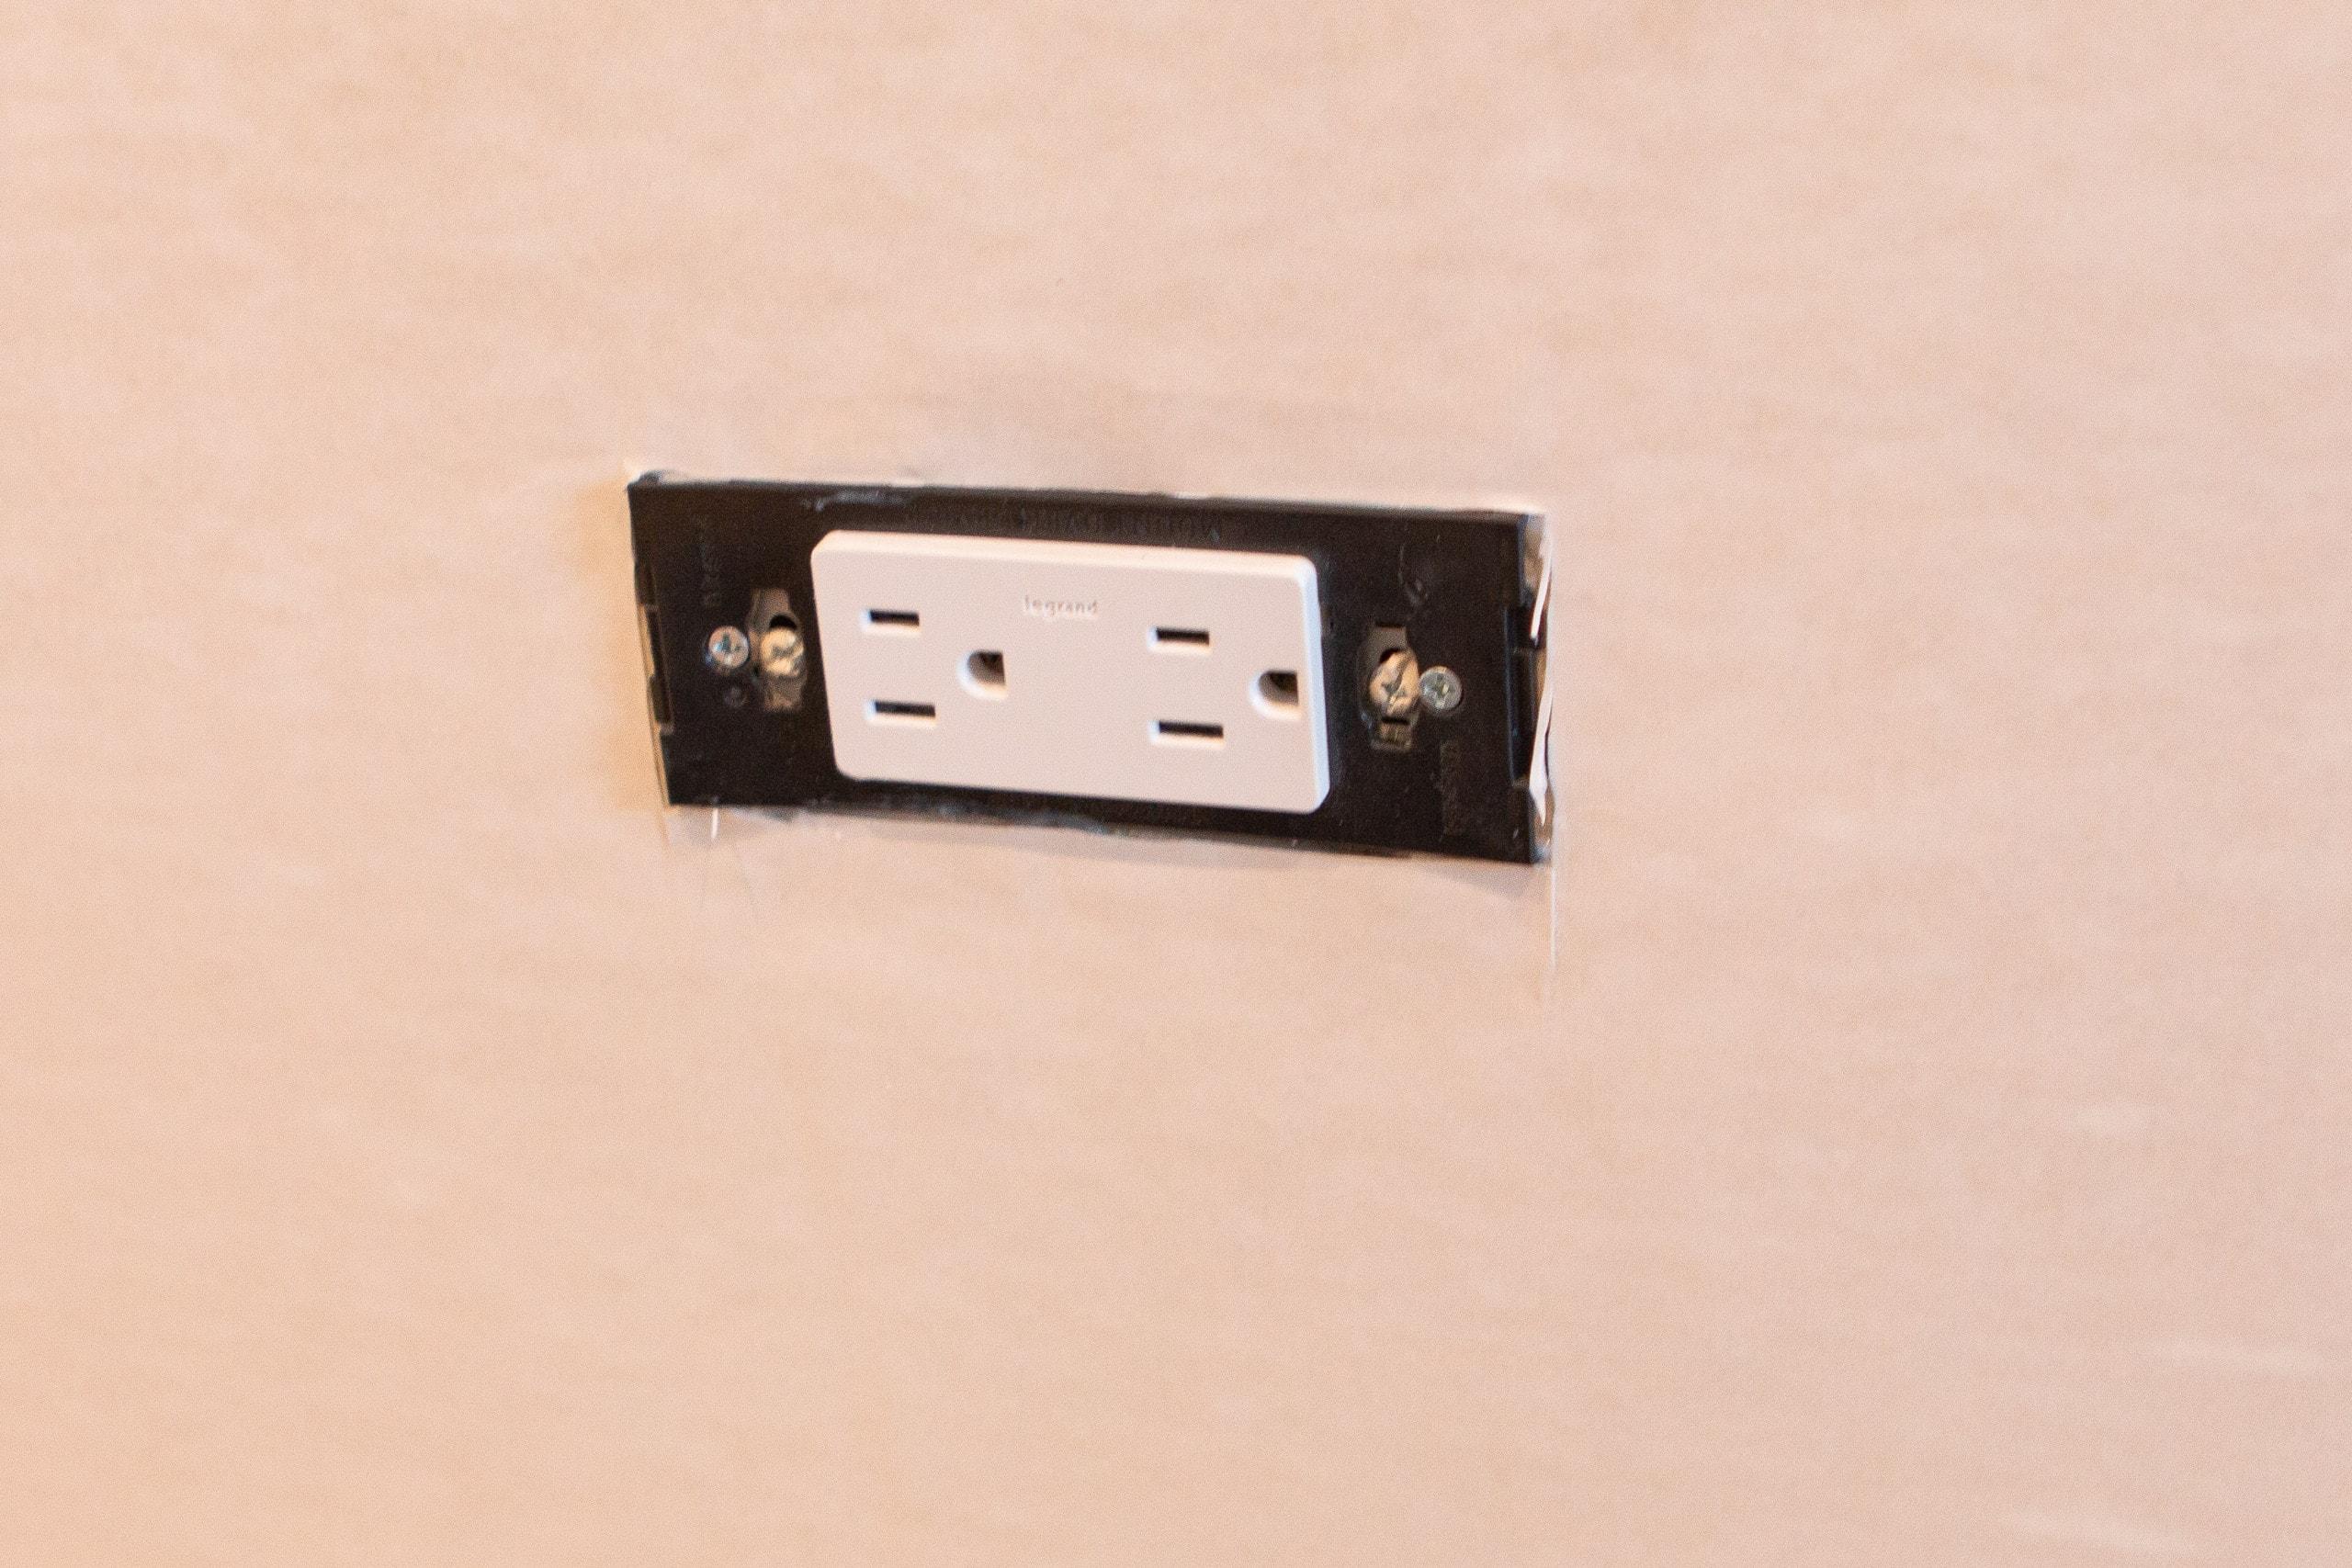 Cutting wallpaper around an outlet